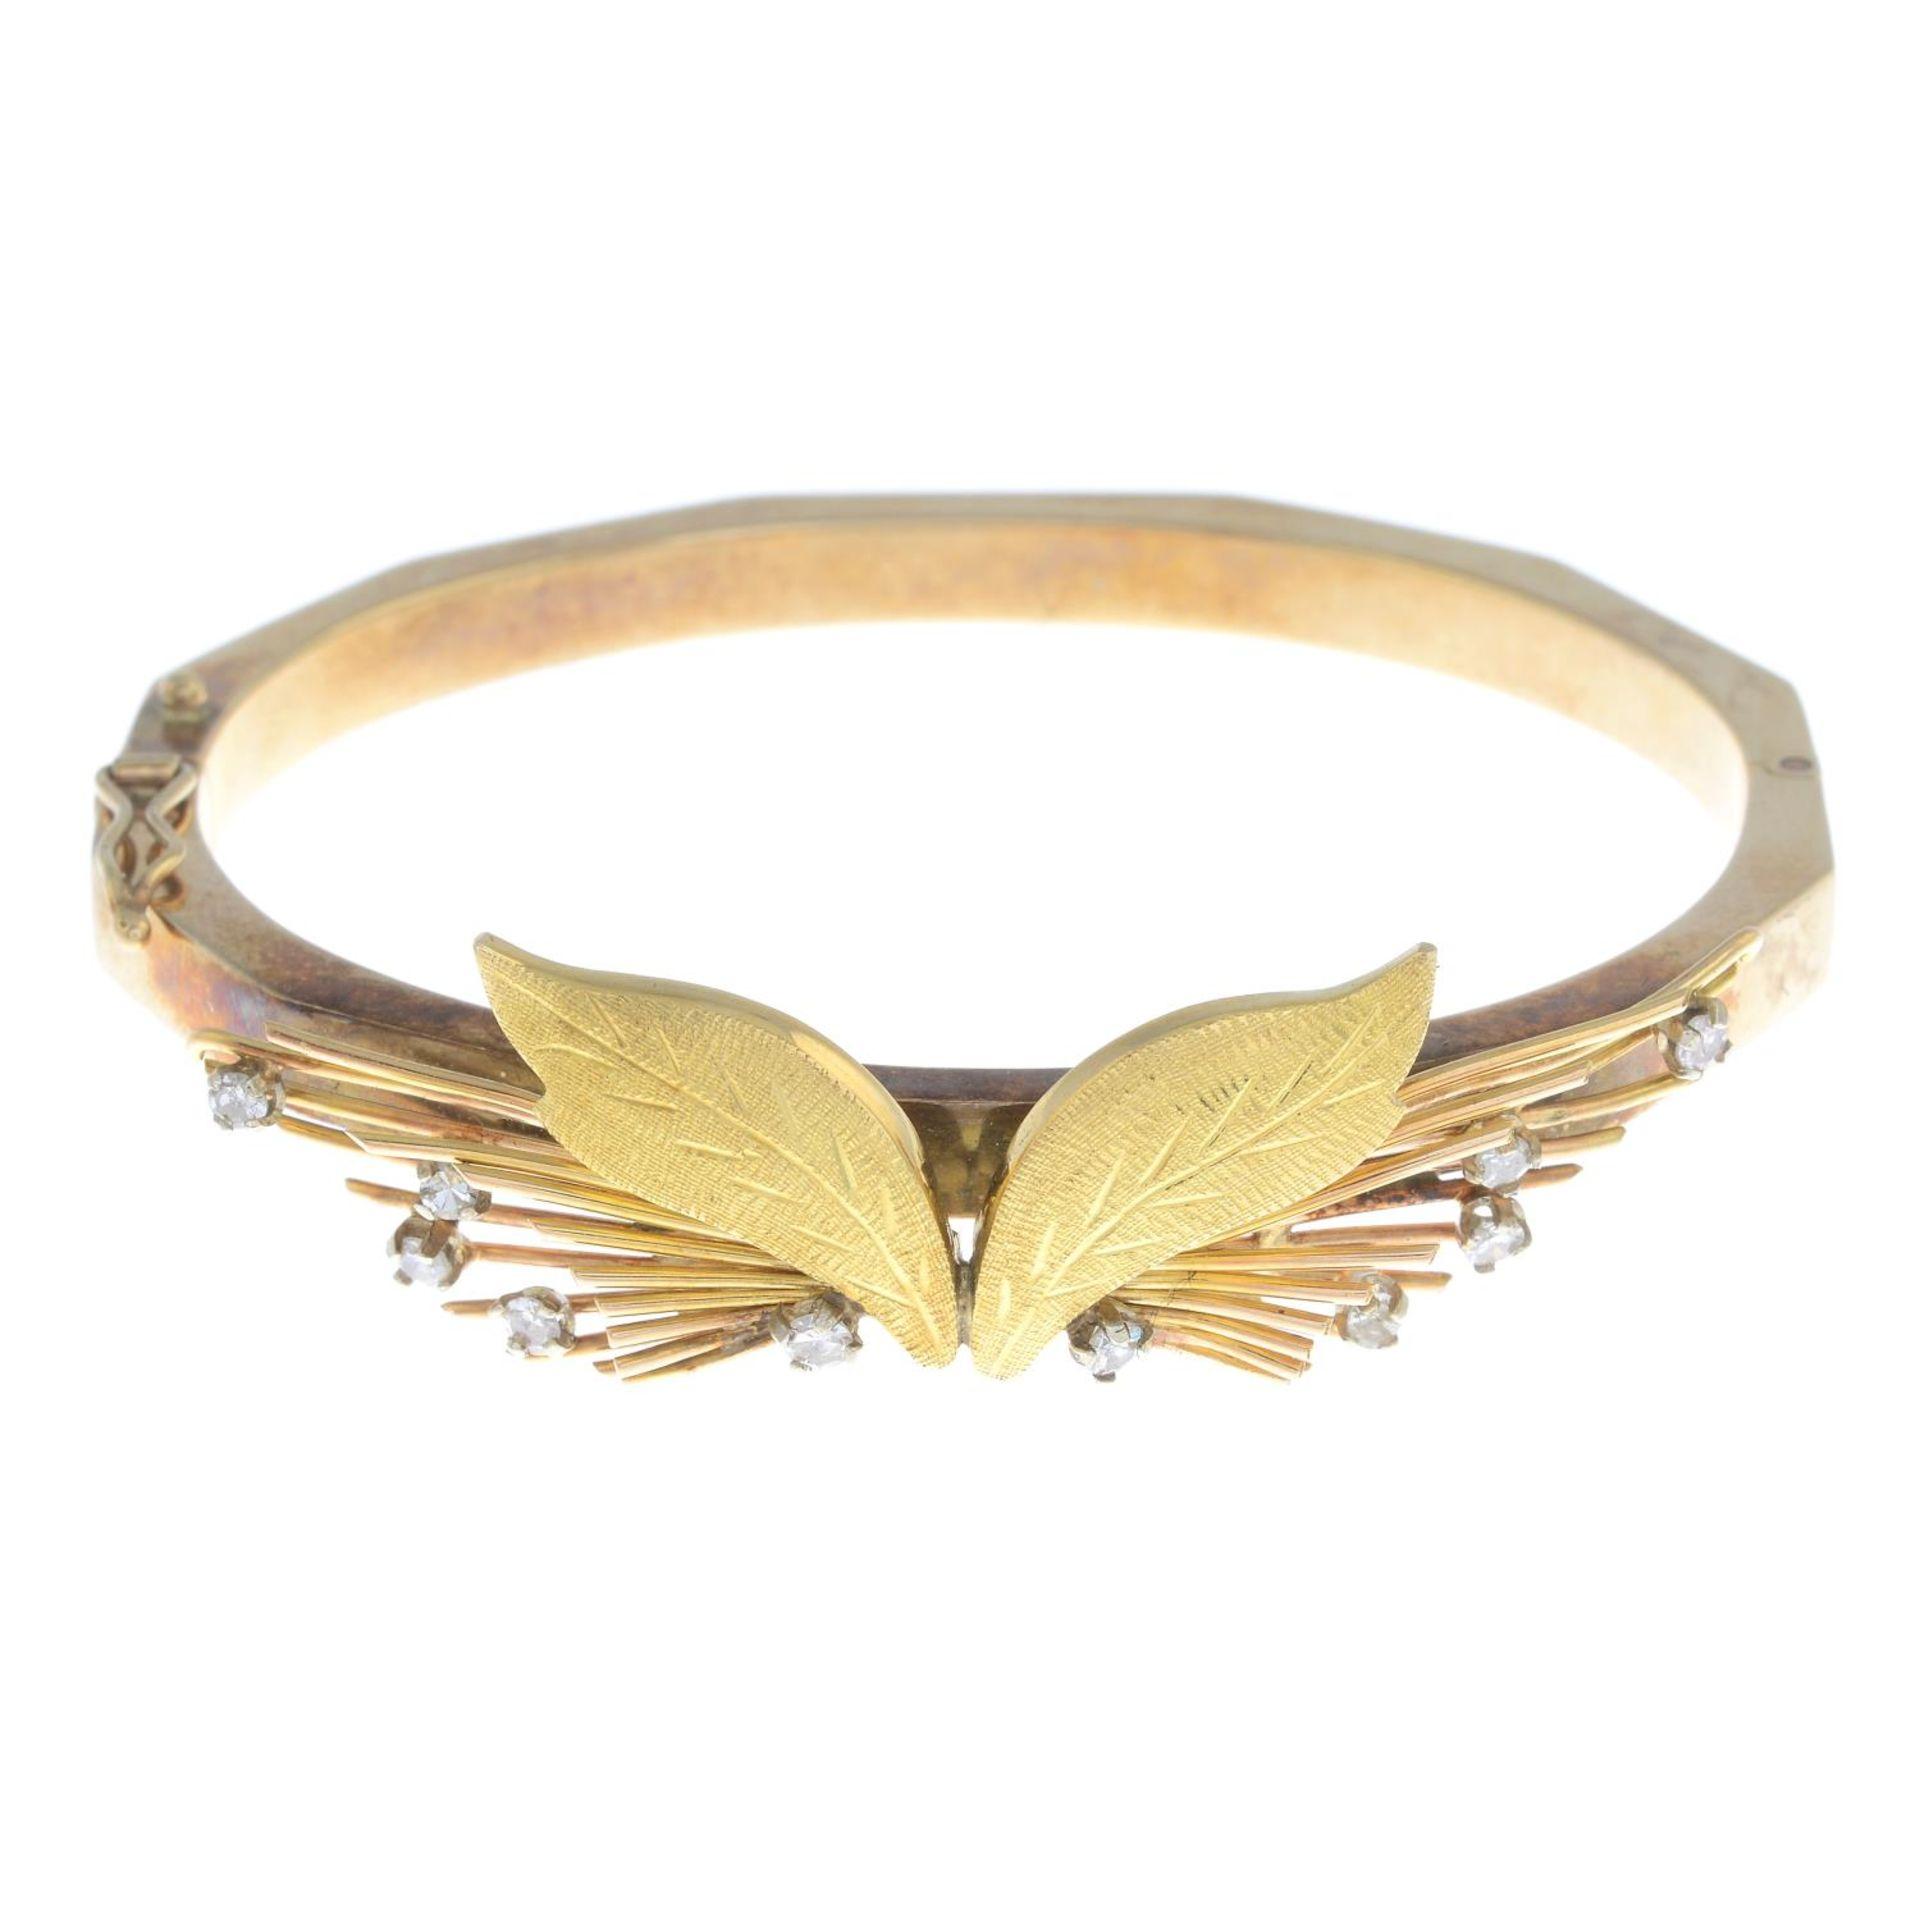 A 9ct gold diamond bi-colour bangle,